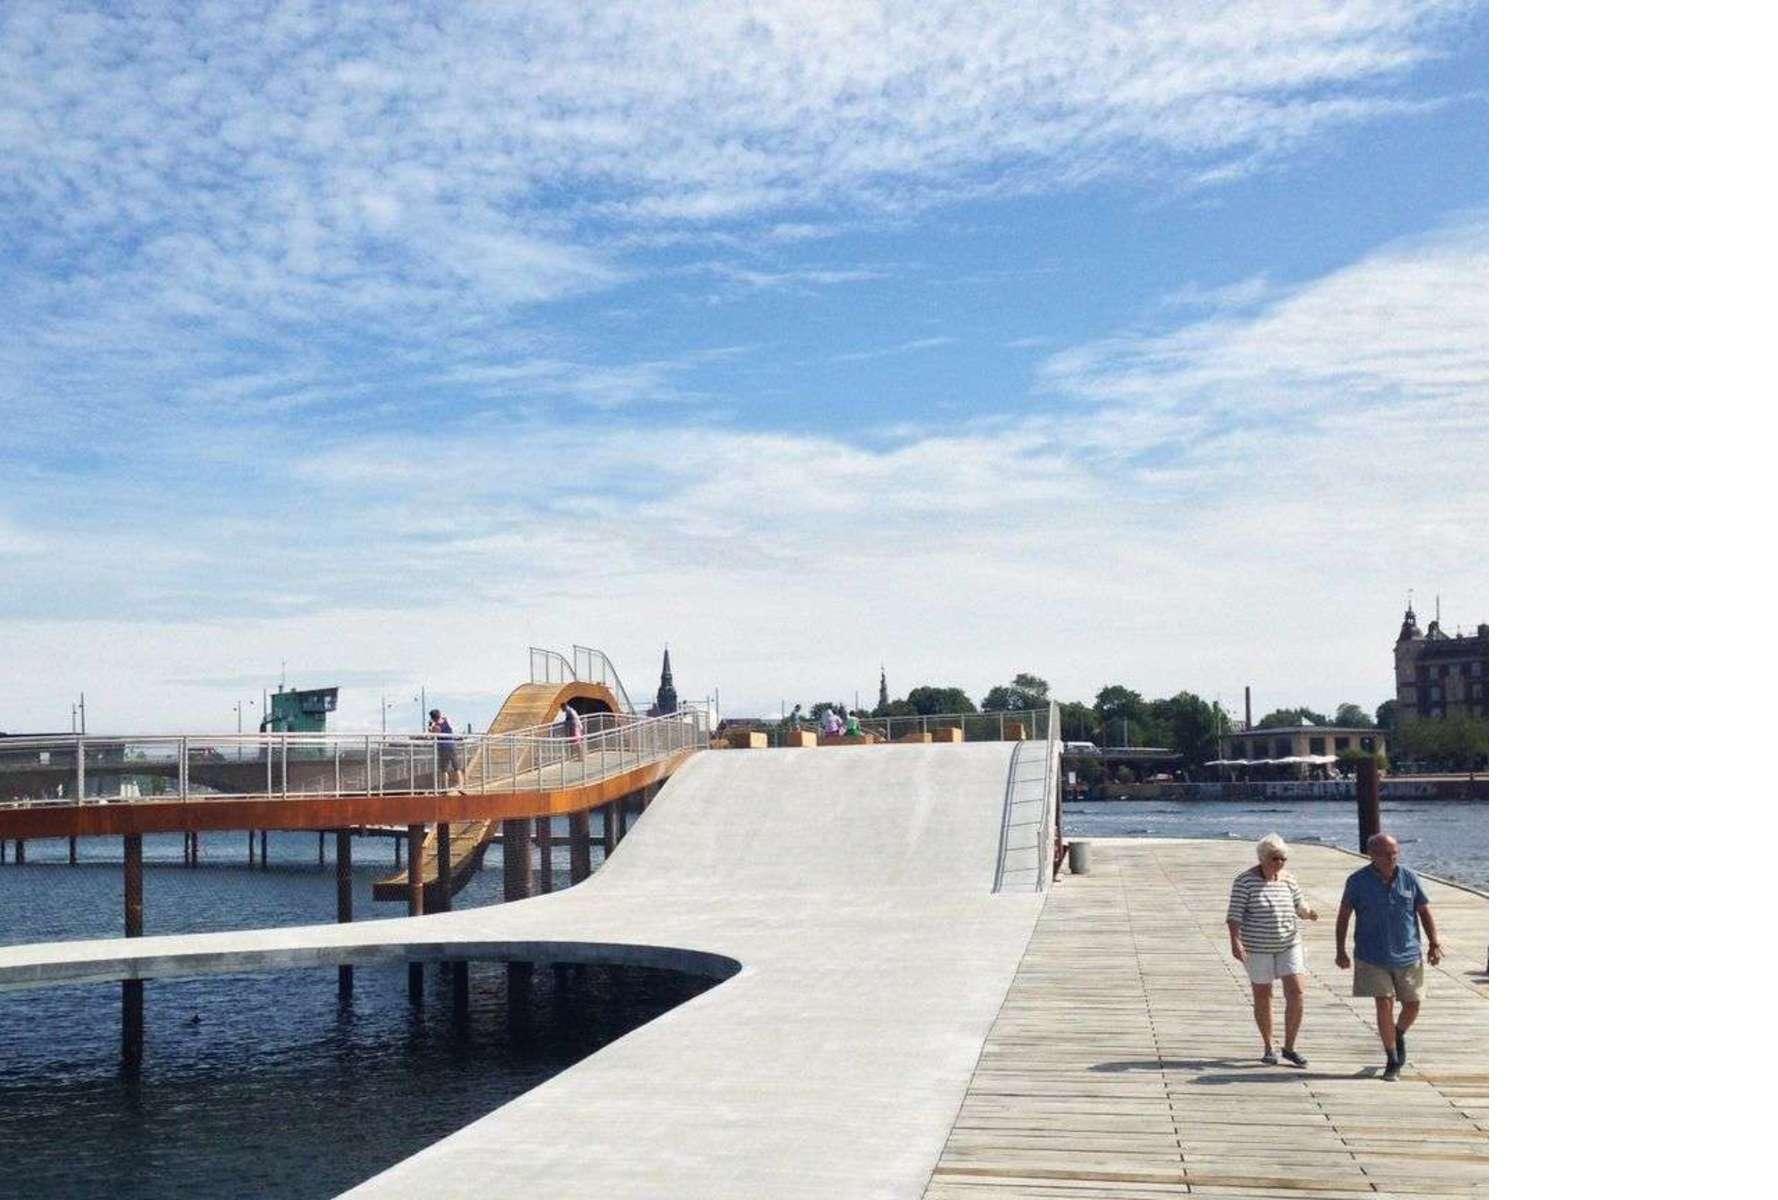 jds julien de smedt architects: bord de mer de kalvebod brygge a